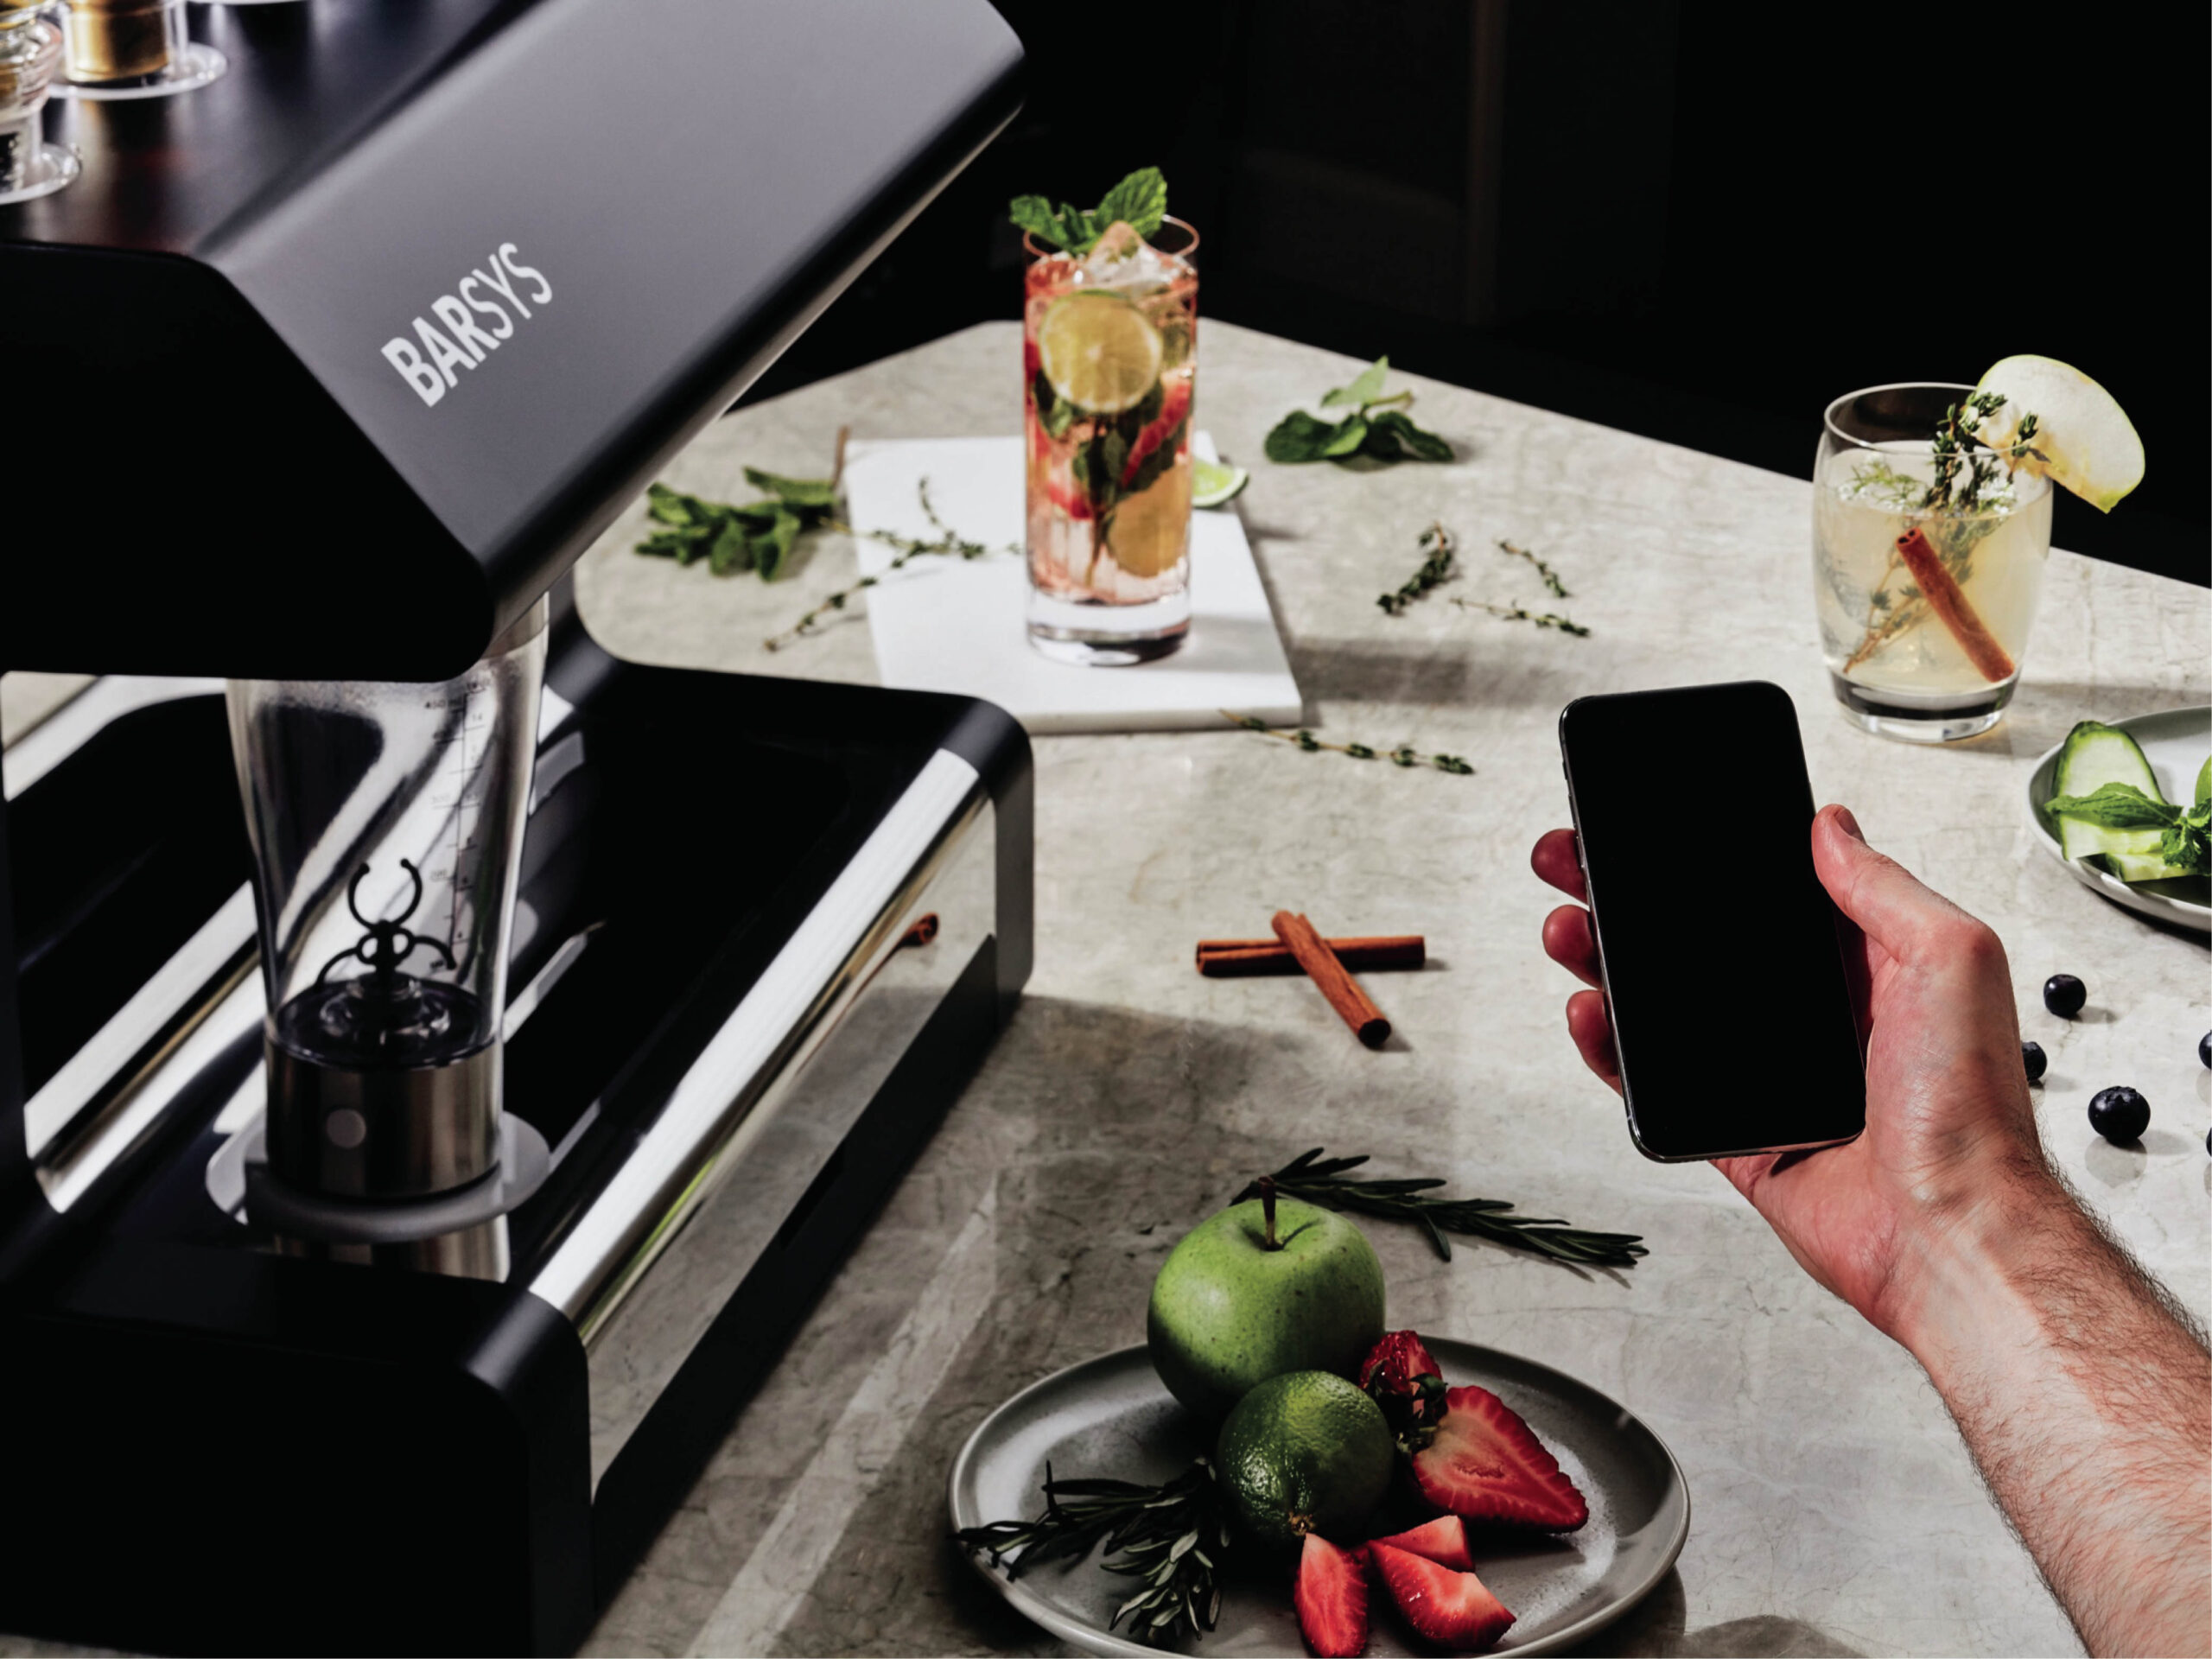 British Airways robotic cocktail maker